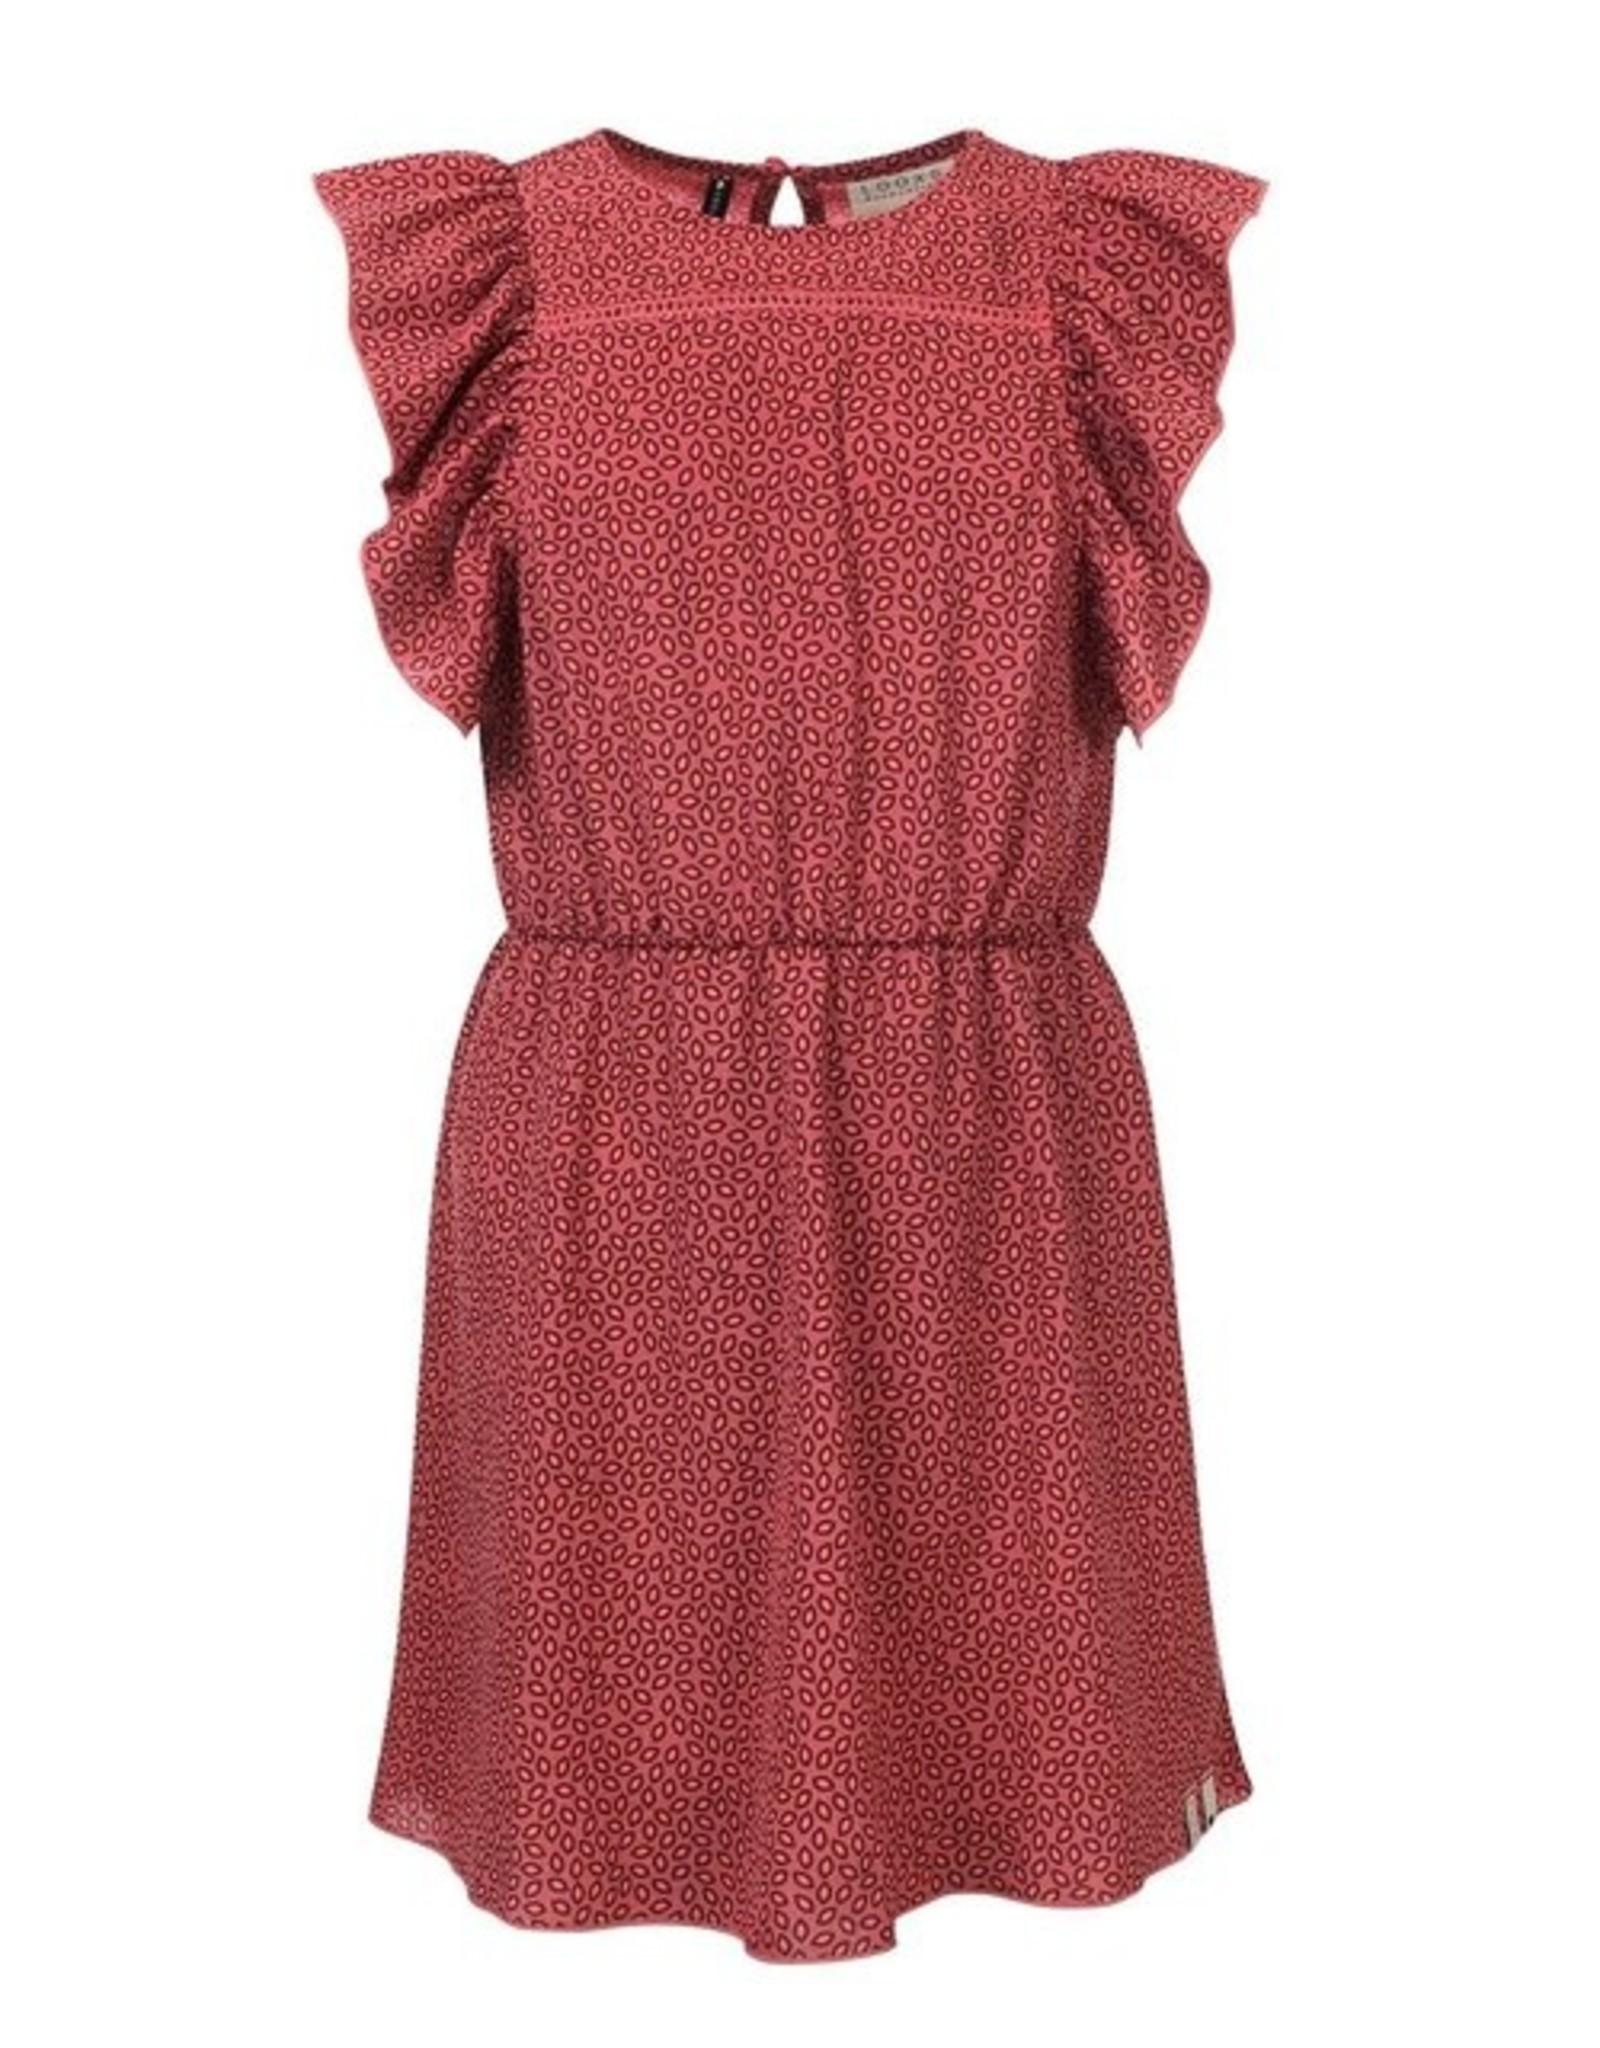 LOOXS 10sixteen 10Sixteen printed dress